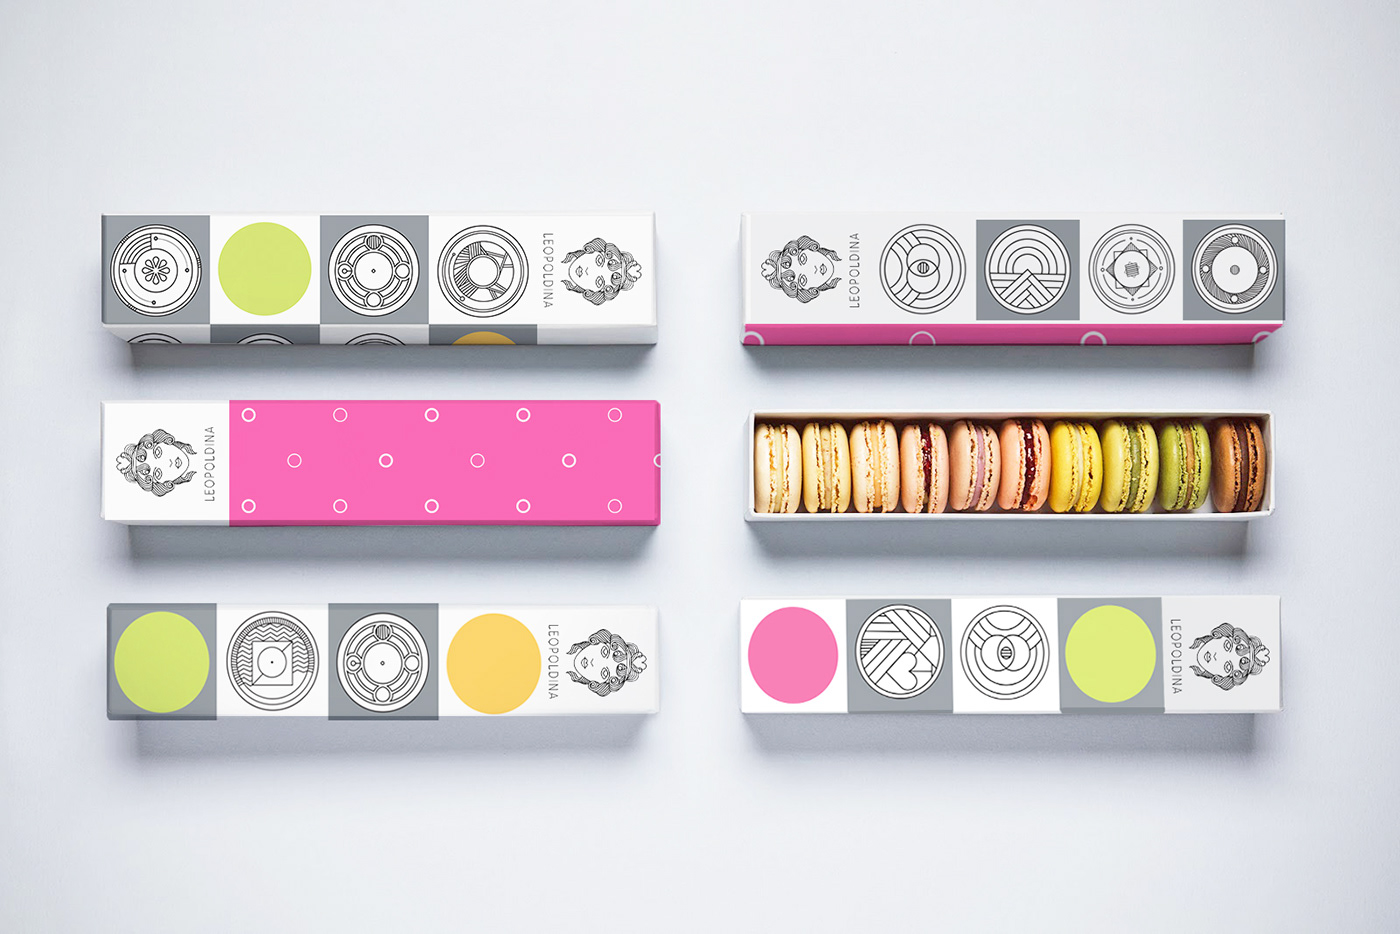 macarons restaurants pink logo illustrations Patterns visual identity Bojana Knezevic design Packaging